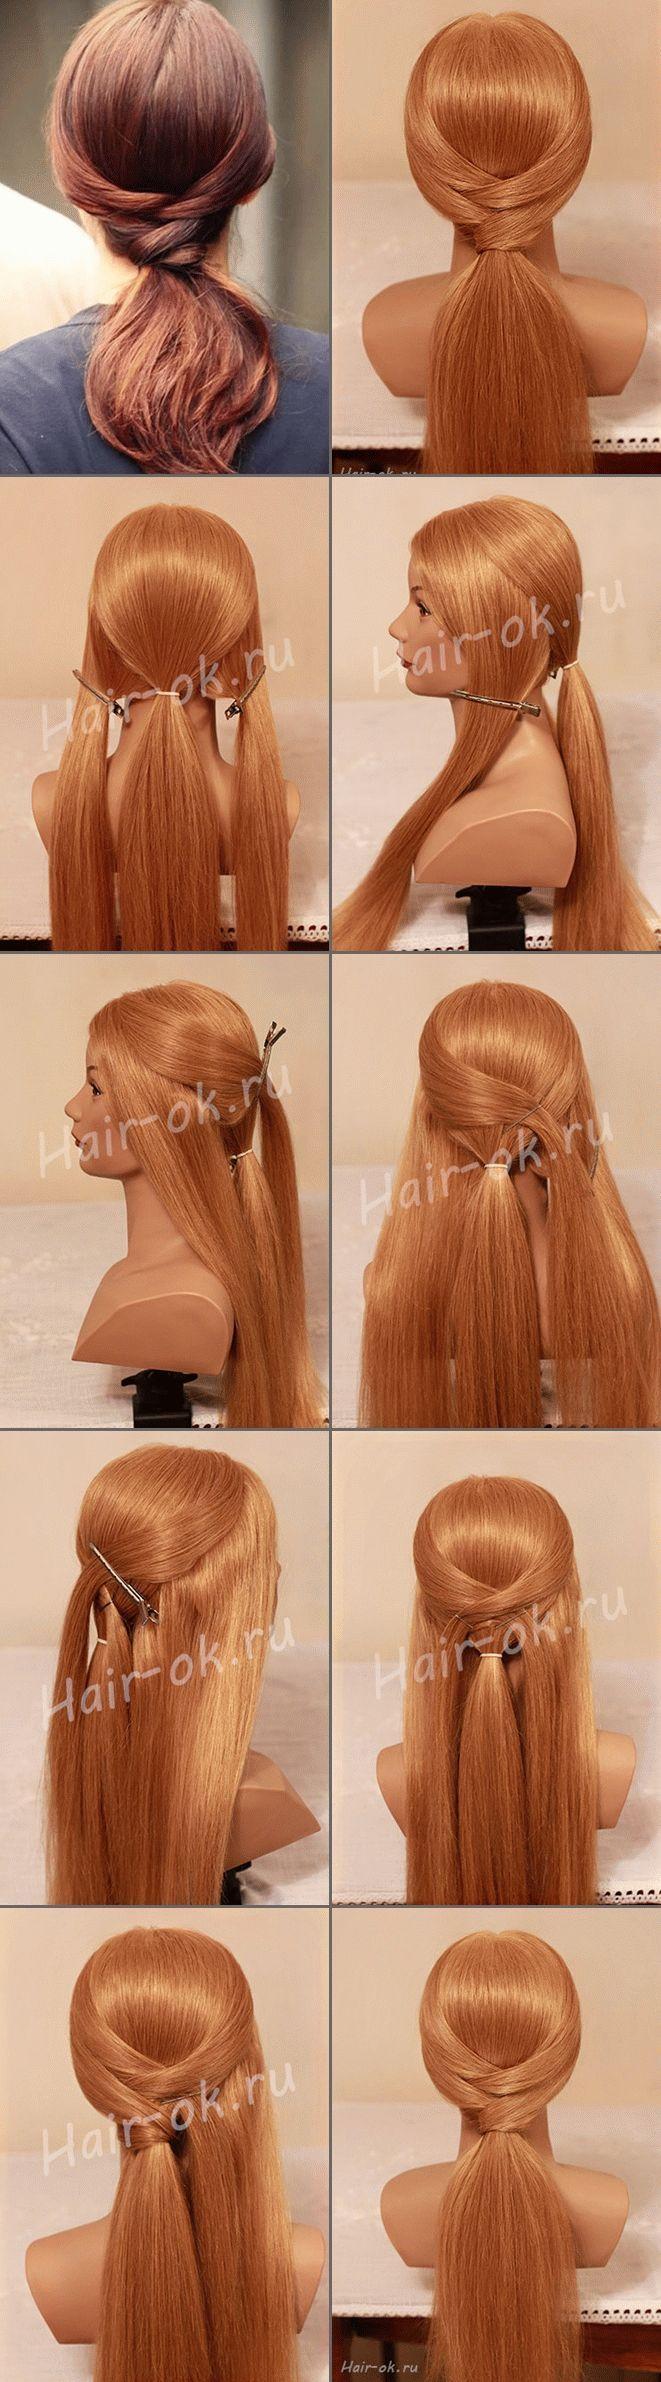 How to diy easy gossip girl hairstyle penteados pinterest